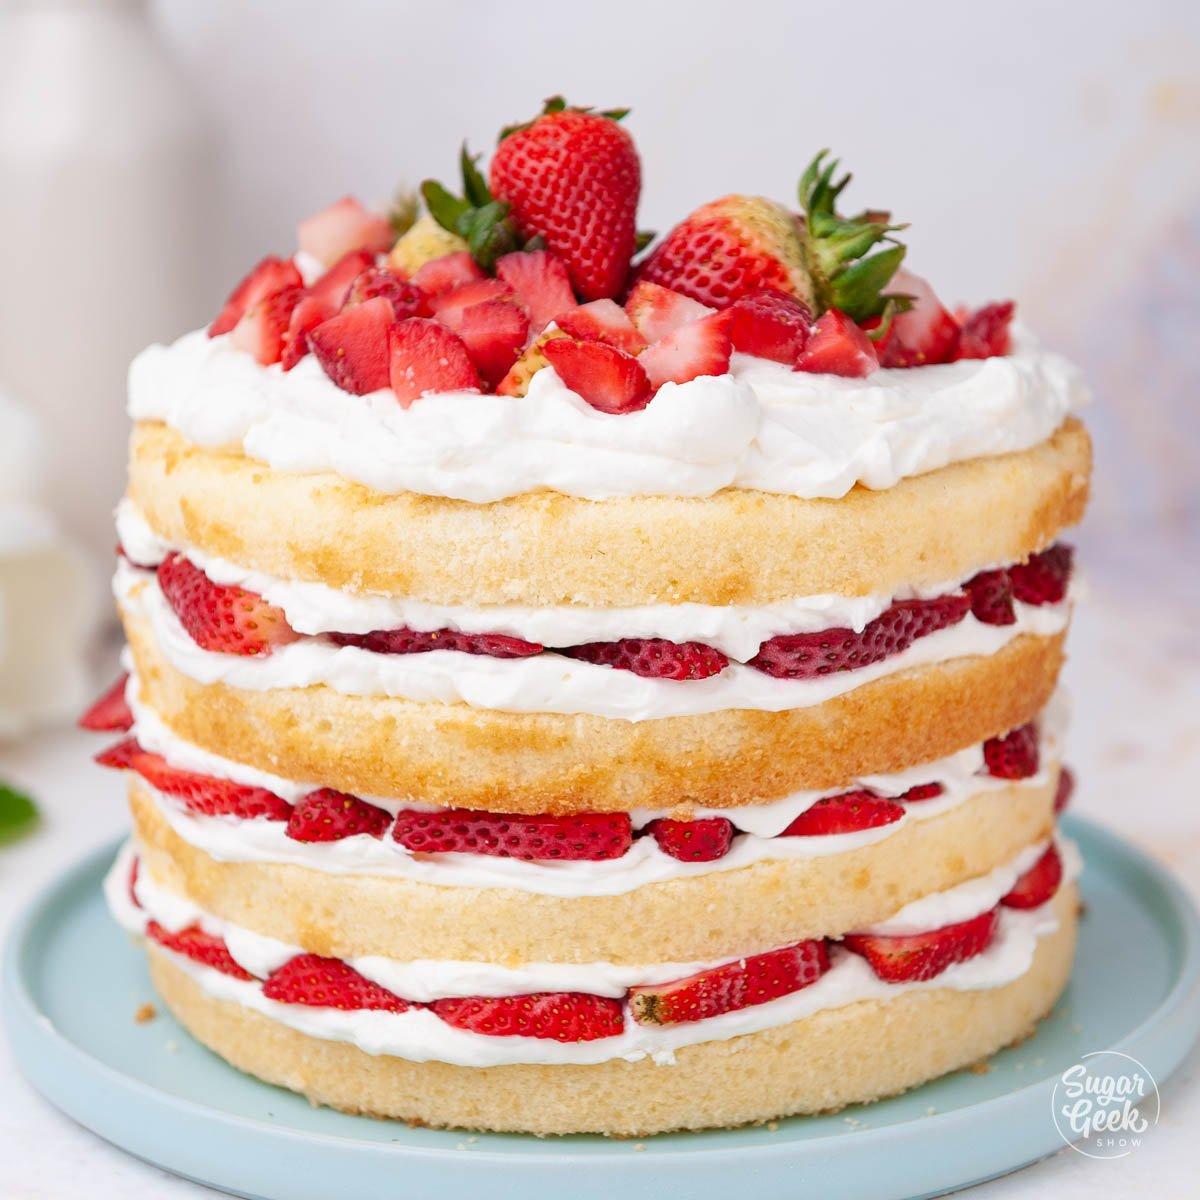 closeup of strawberry shortcake on a blue plate